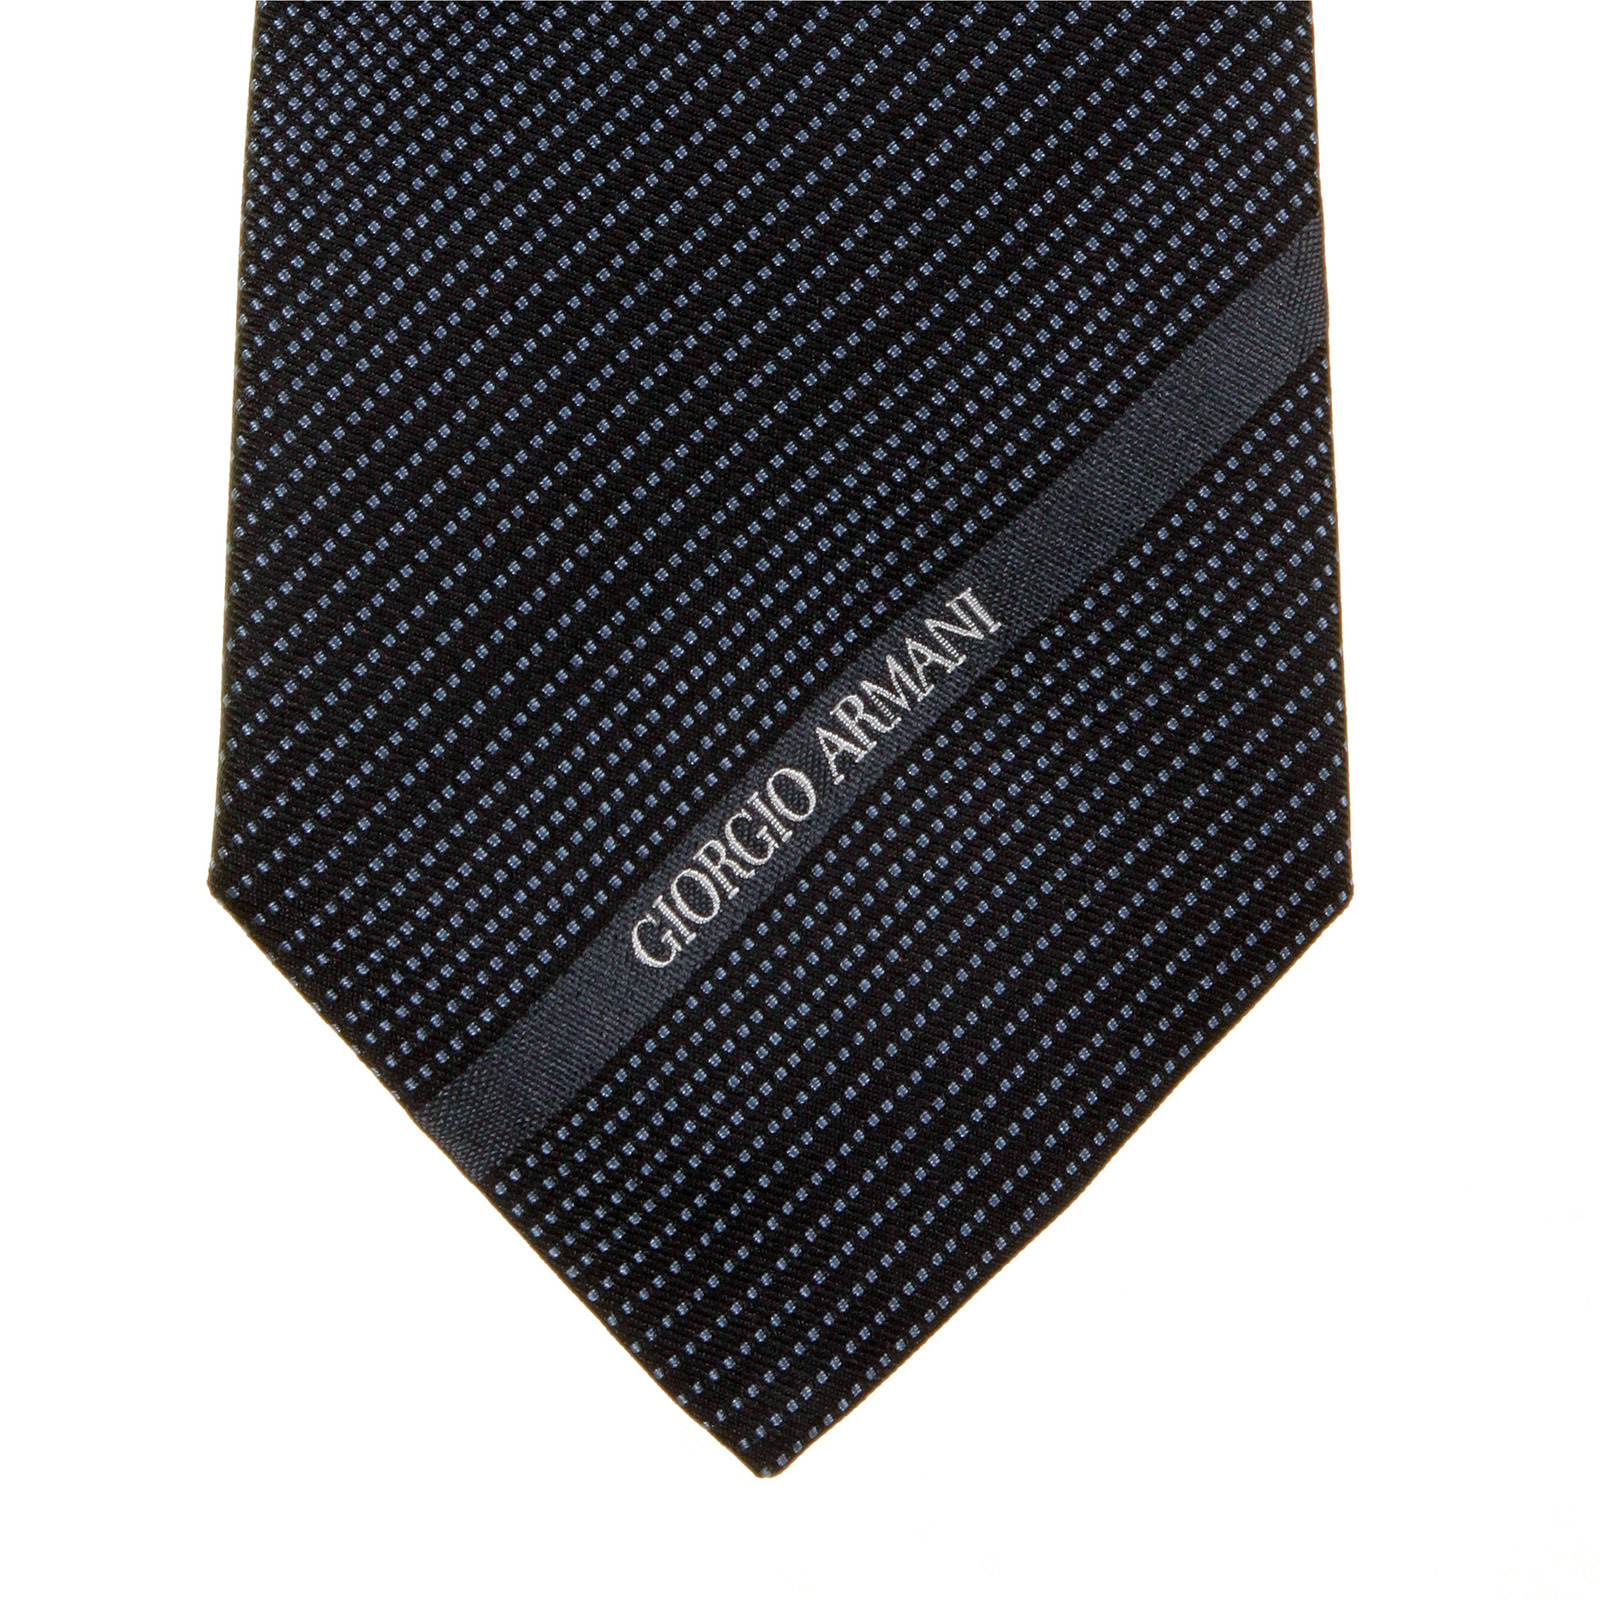 Tie Giorgio Armani Black Pin Dot Silk Tie 19w316 Gam1139